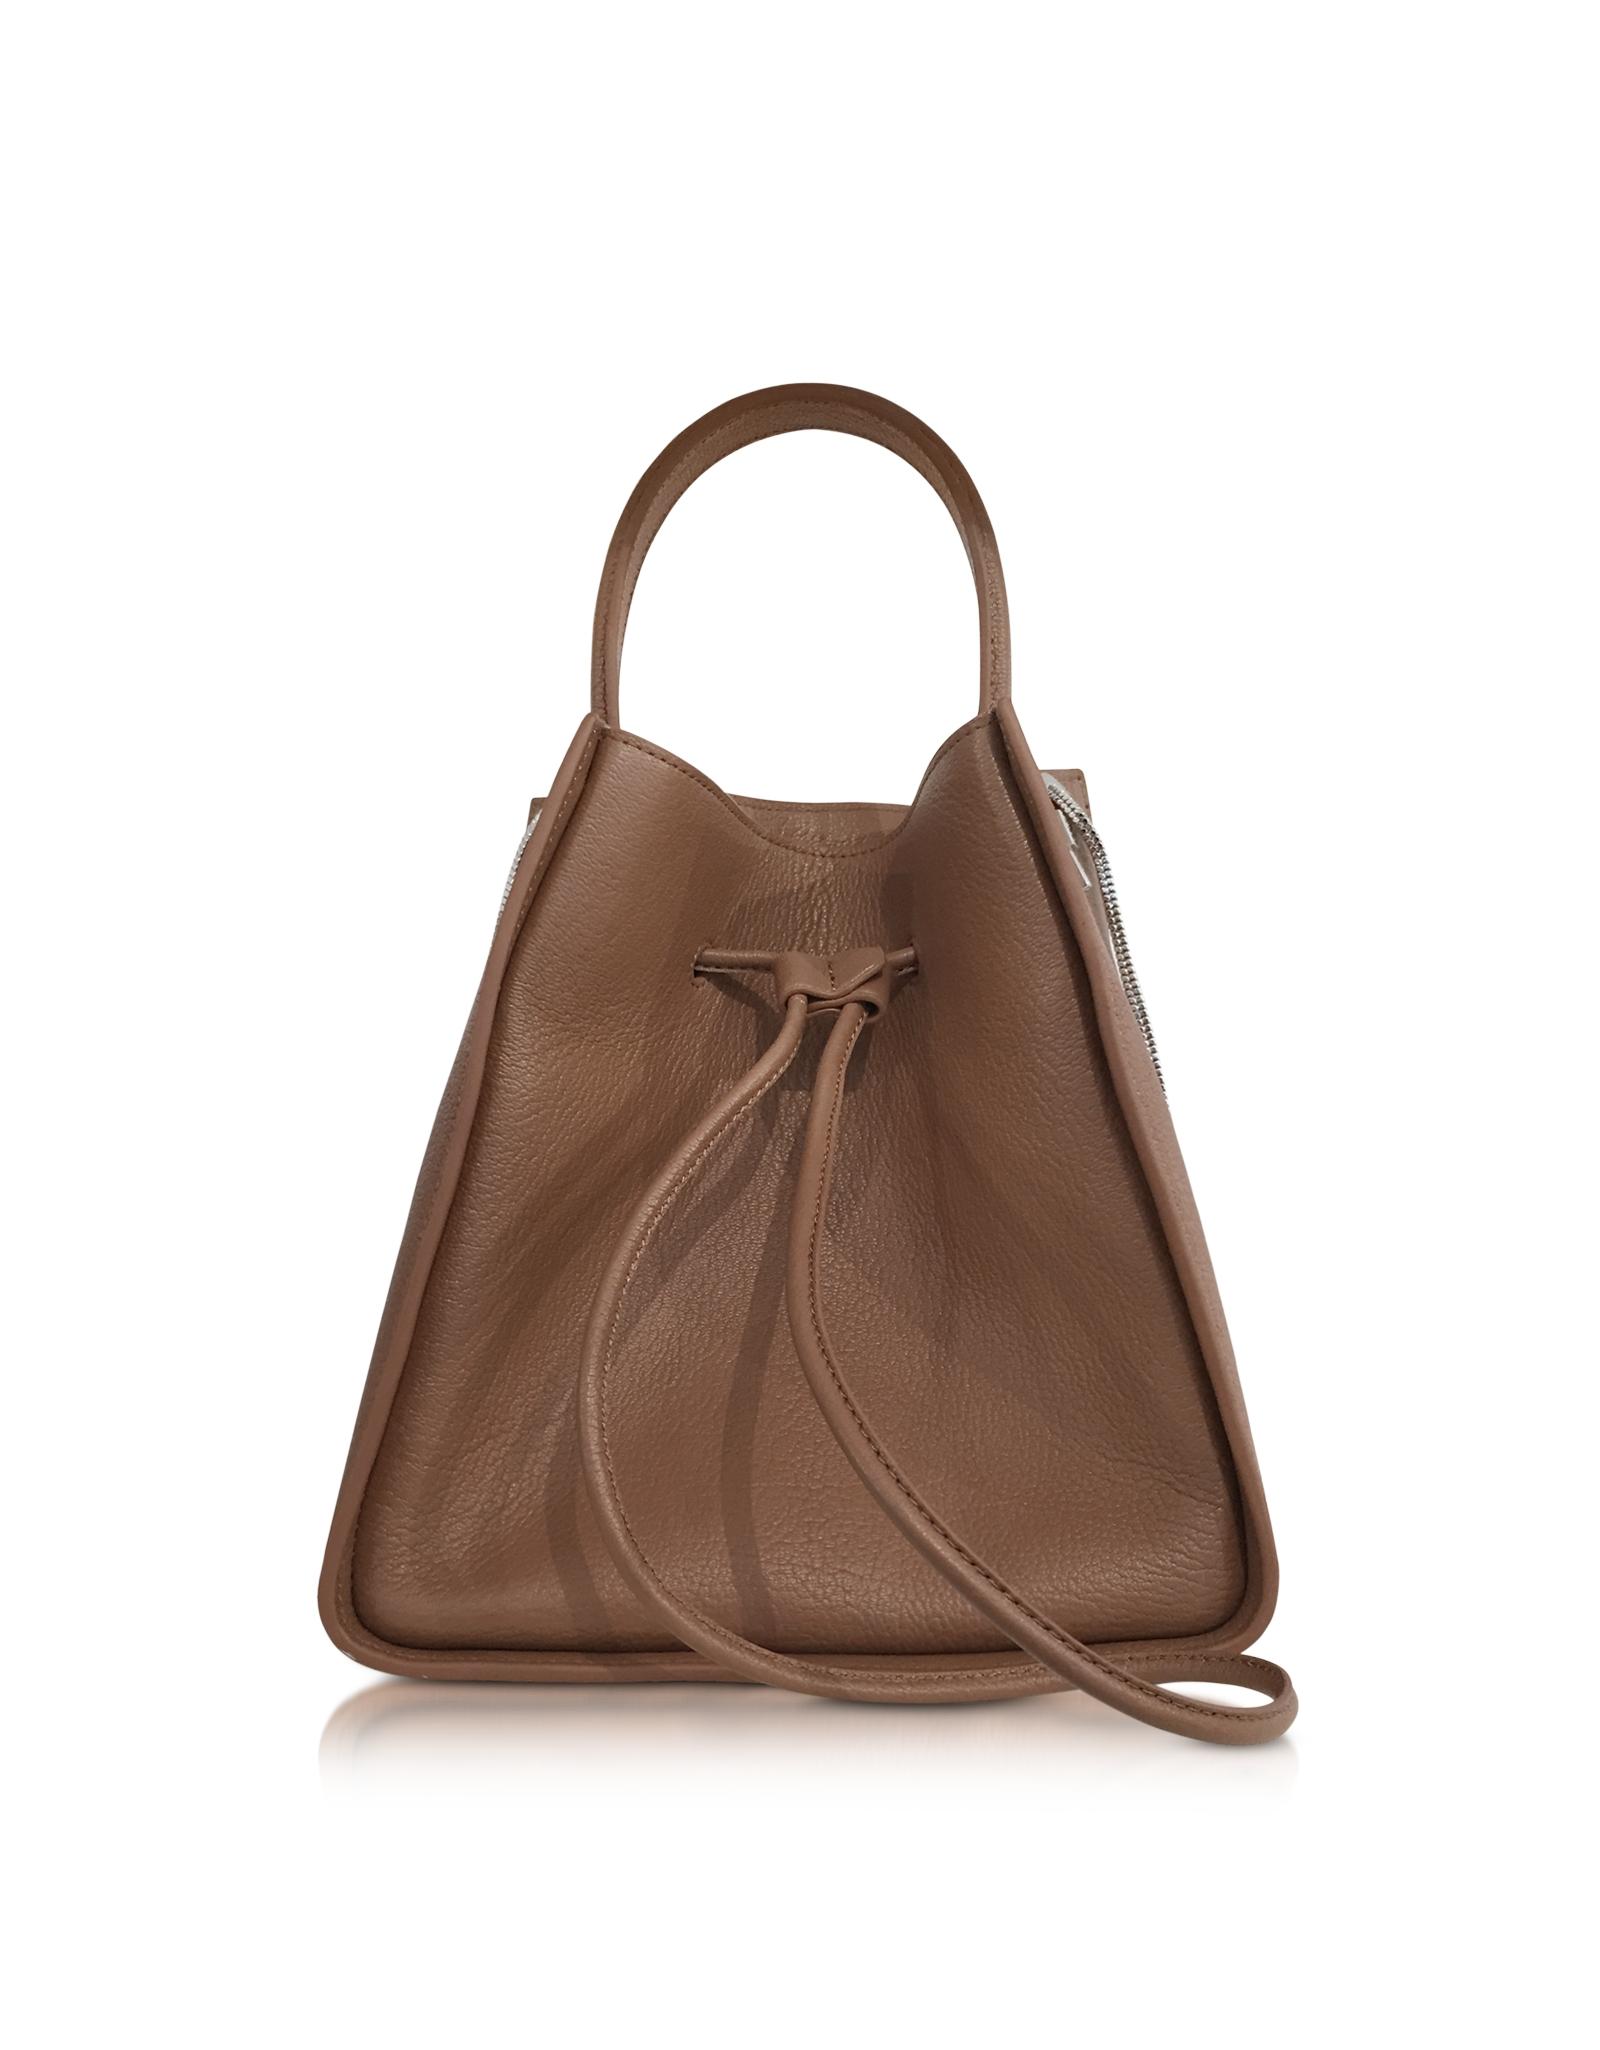 3 1 Phillip Lim Cuoio Soleil Small Bucket Drawstring Bag